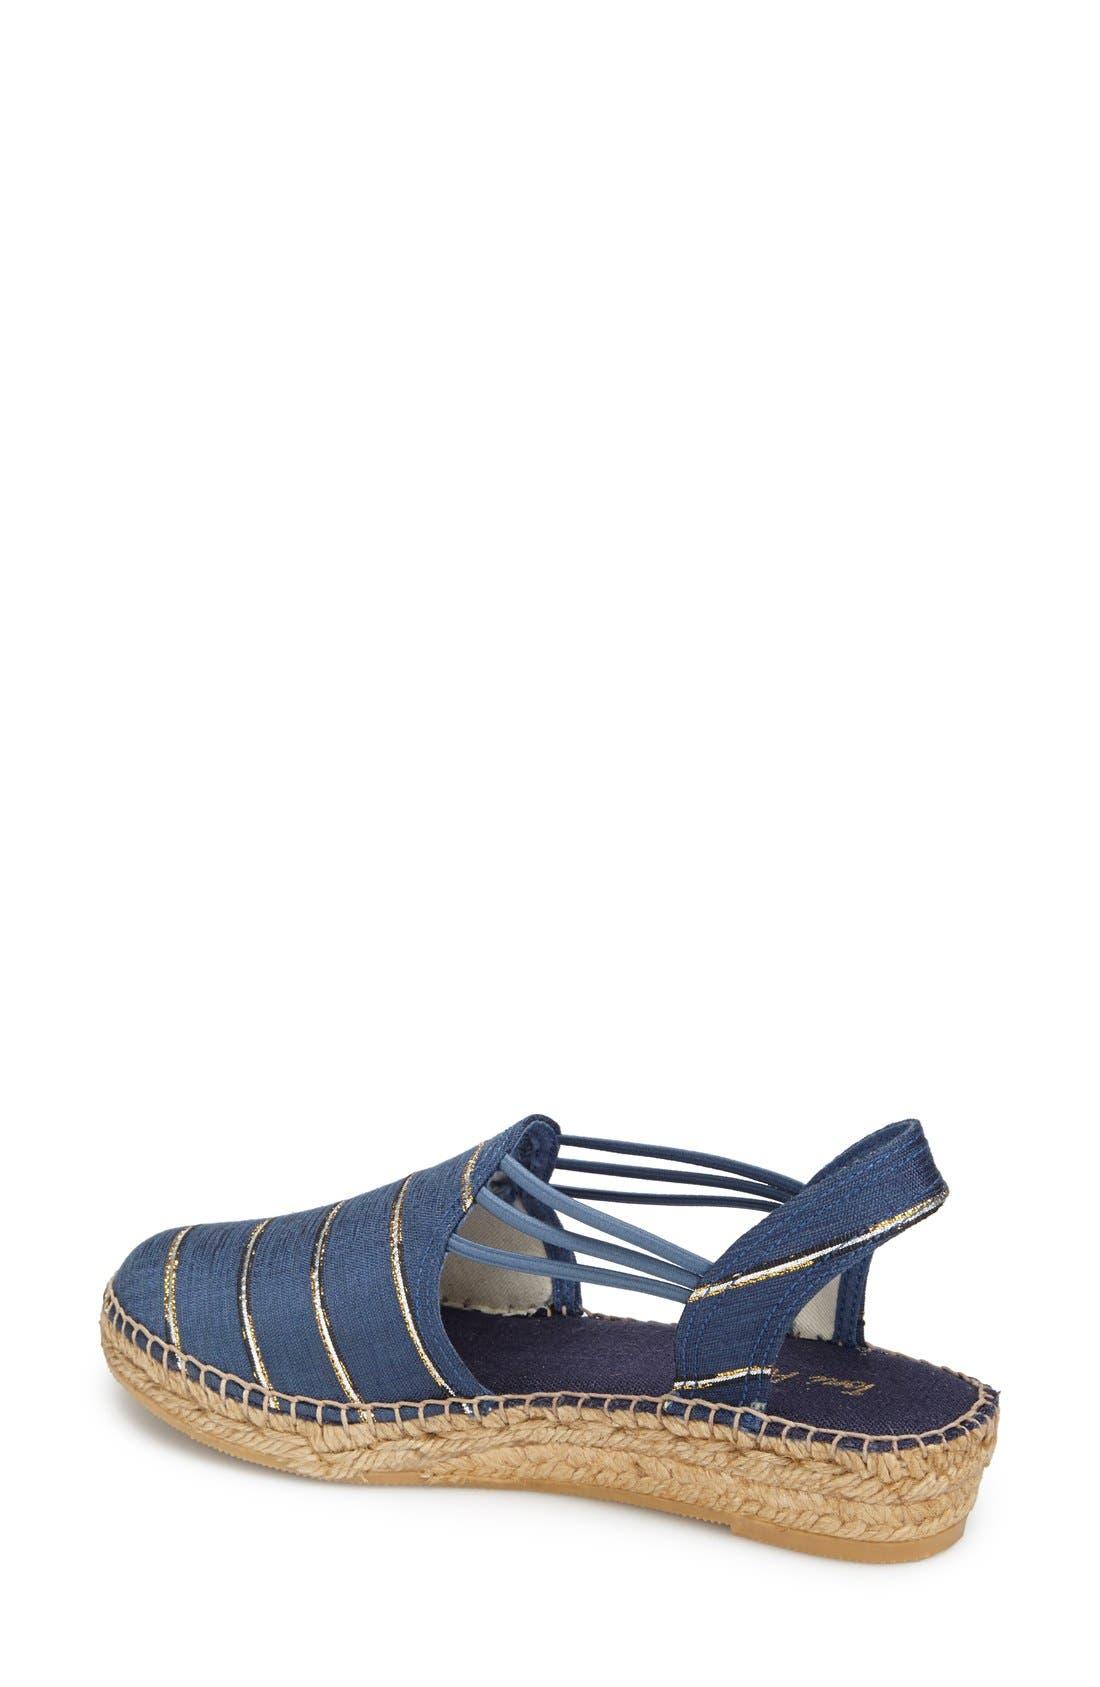 Alternate Image 2  - Toni Pons 'Nantes' Silk Stripe Sandal (Women)